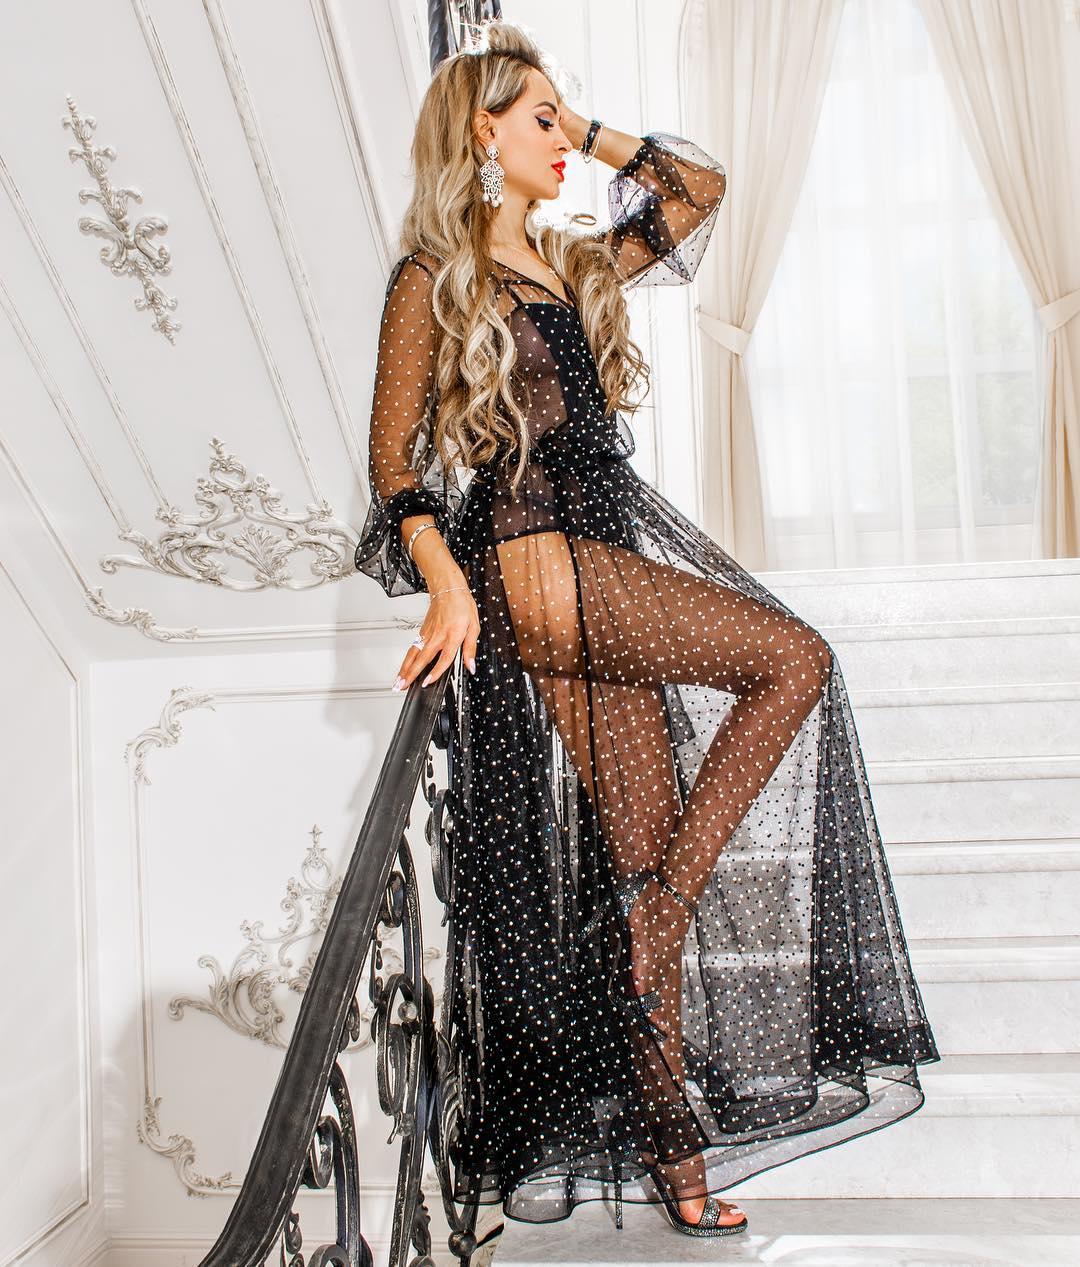 Анна Калашникова Голая